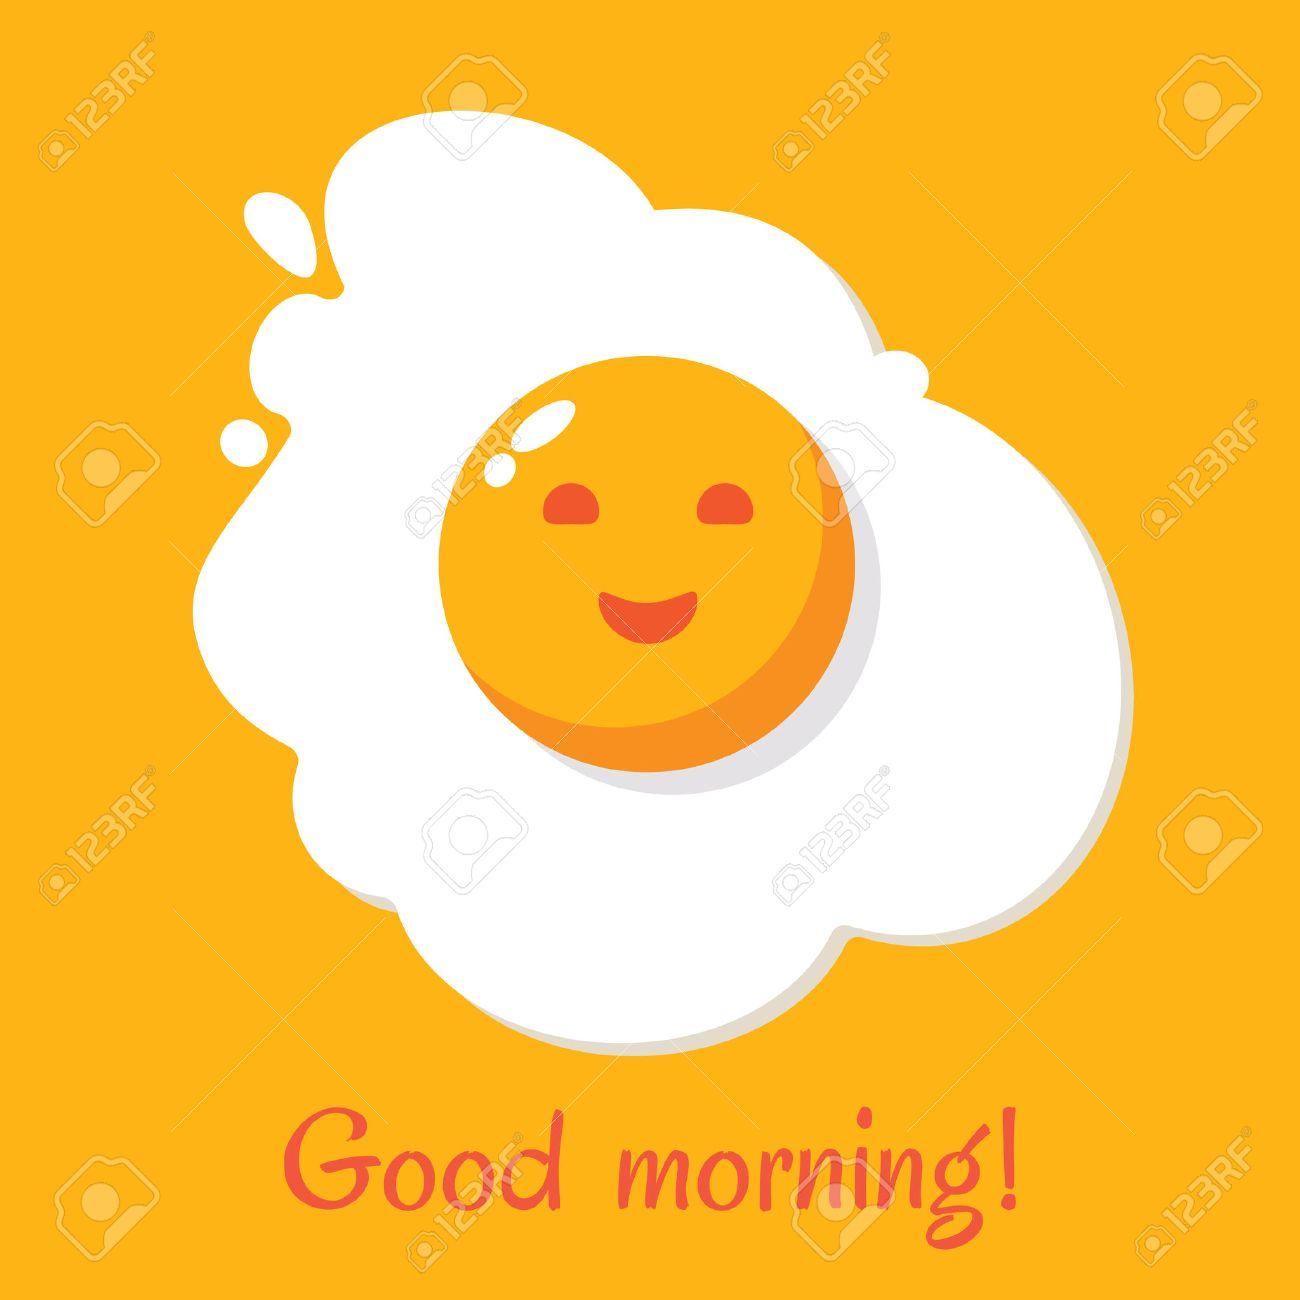 Good morning. Egg breakfast. Fried egg isolated on yellow background. Fried egg flat icon. Scrambled egg. Fried egg in cartoon style. Vector illustration - 69020181